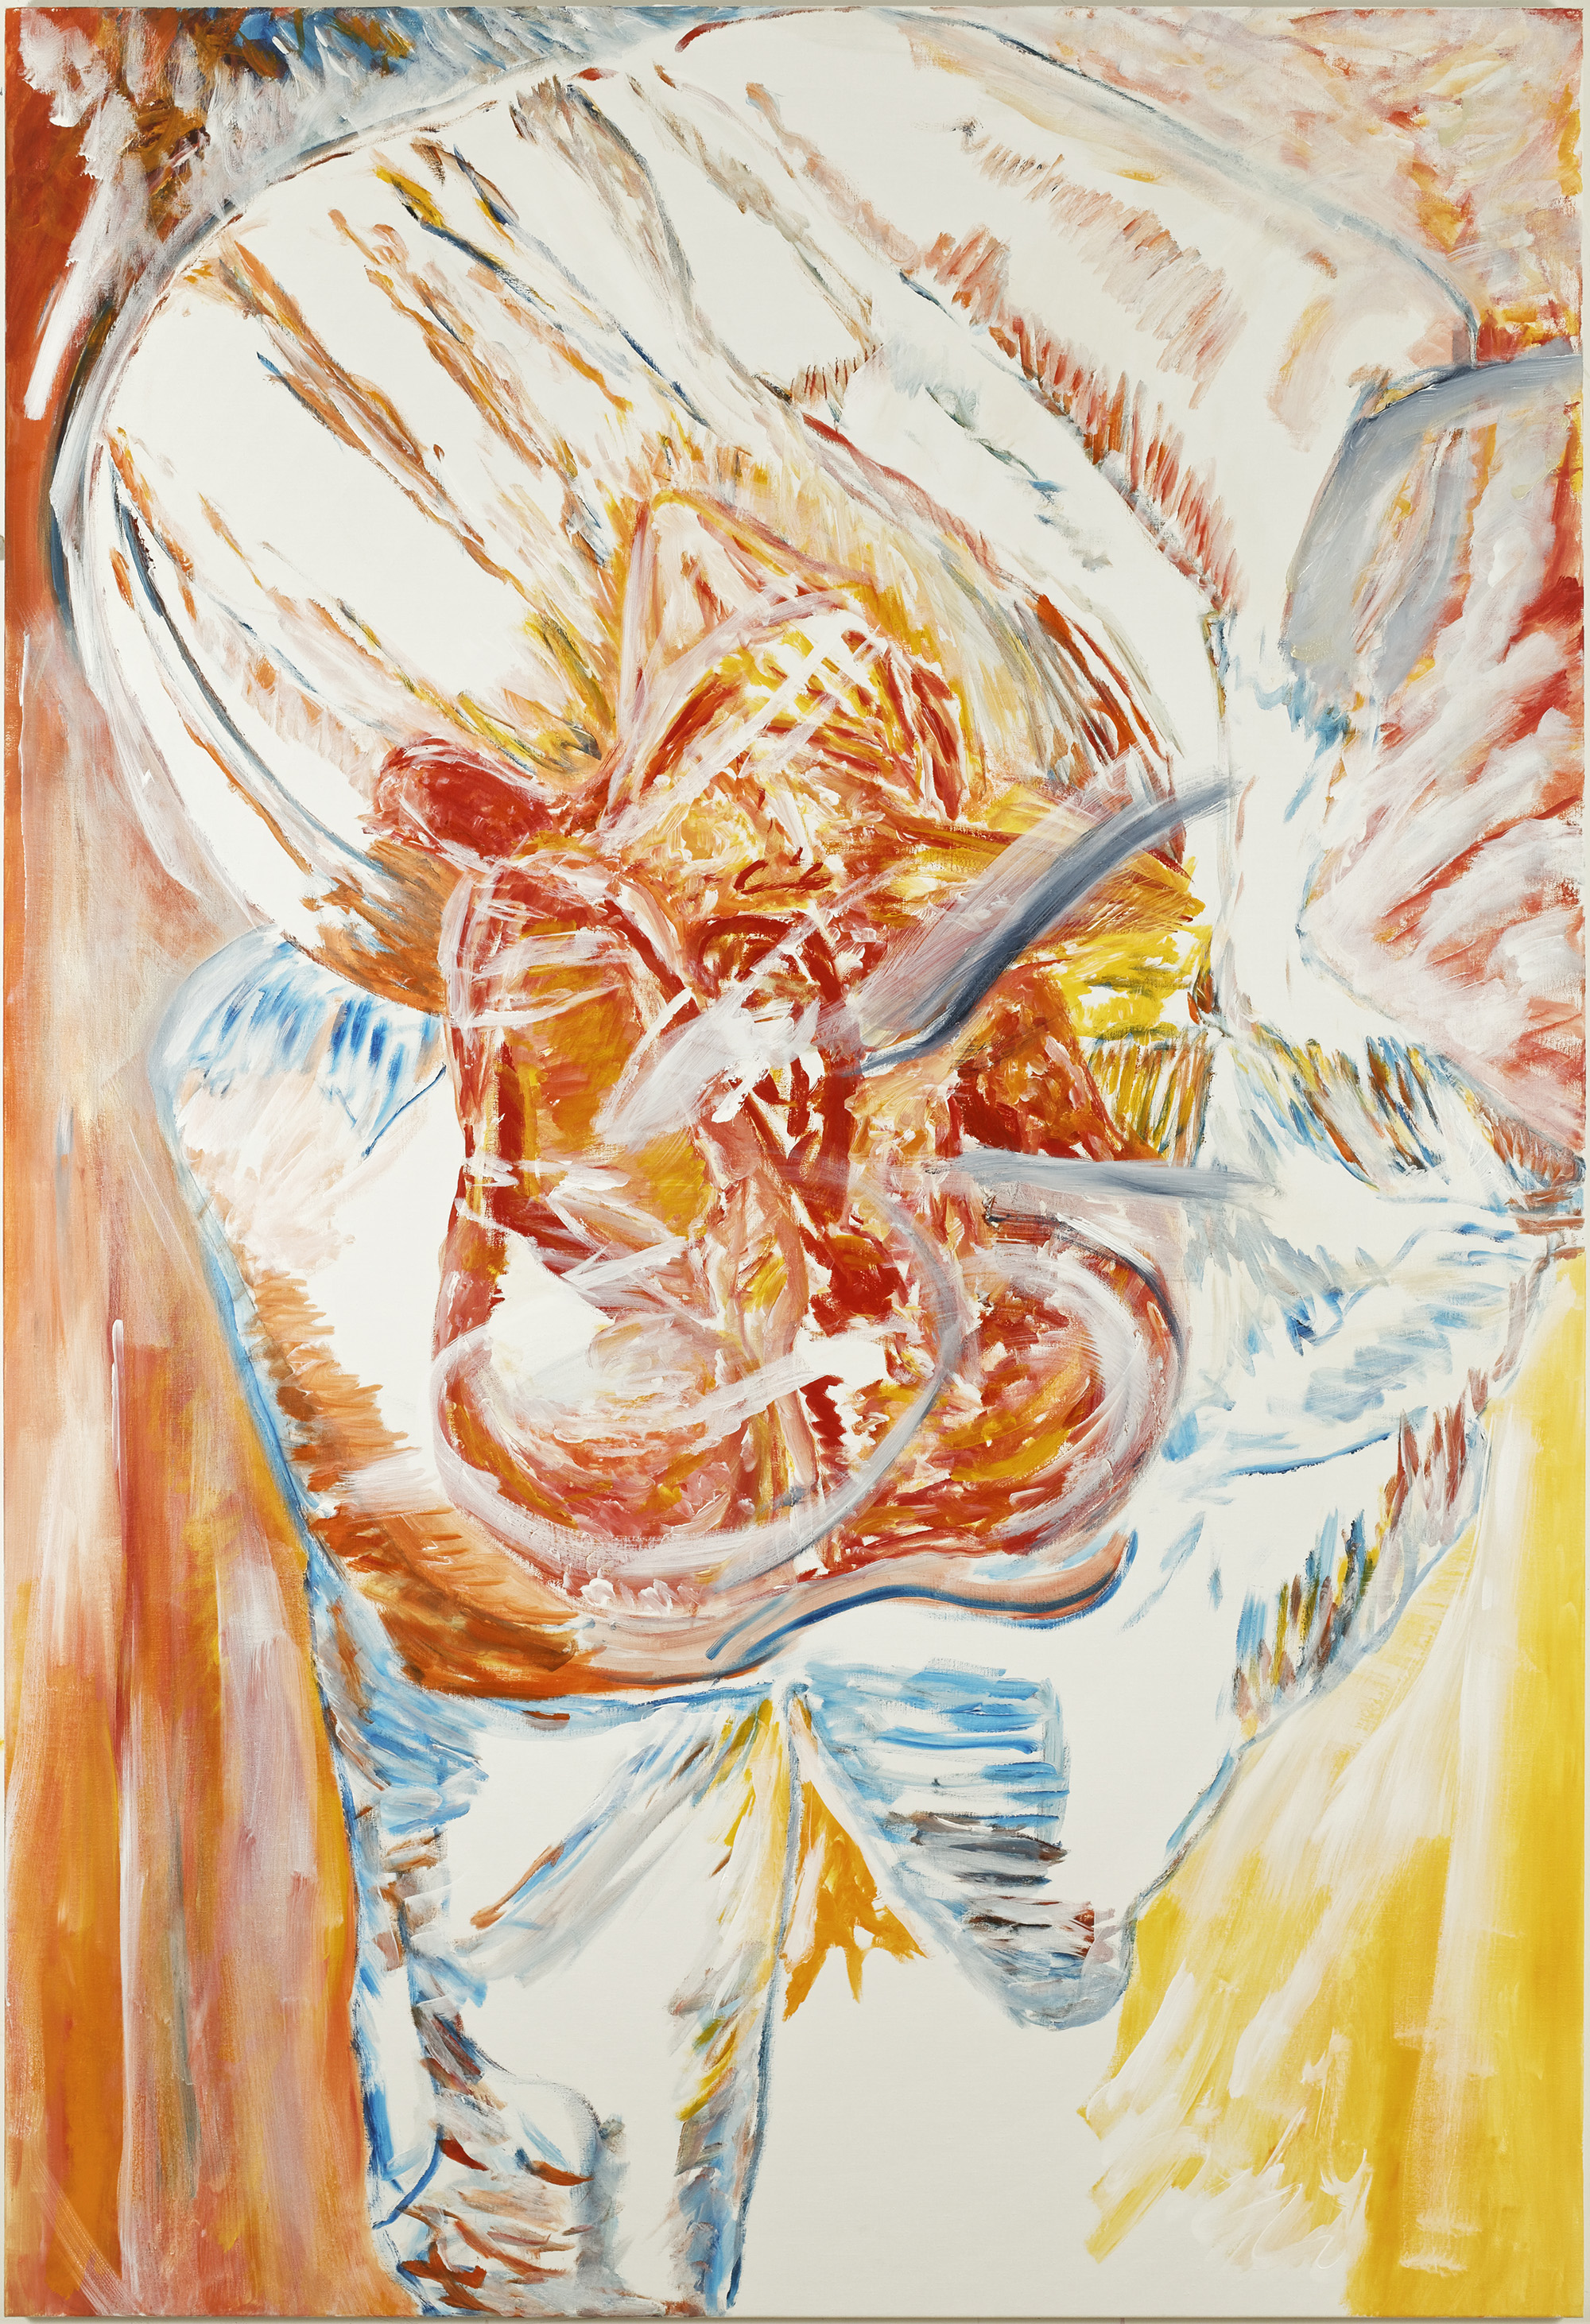 Coeur d'arti-fleur (acrylic on canvas, 130 x 190 cm - 2018)